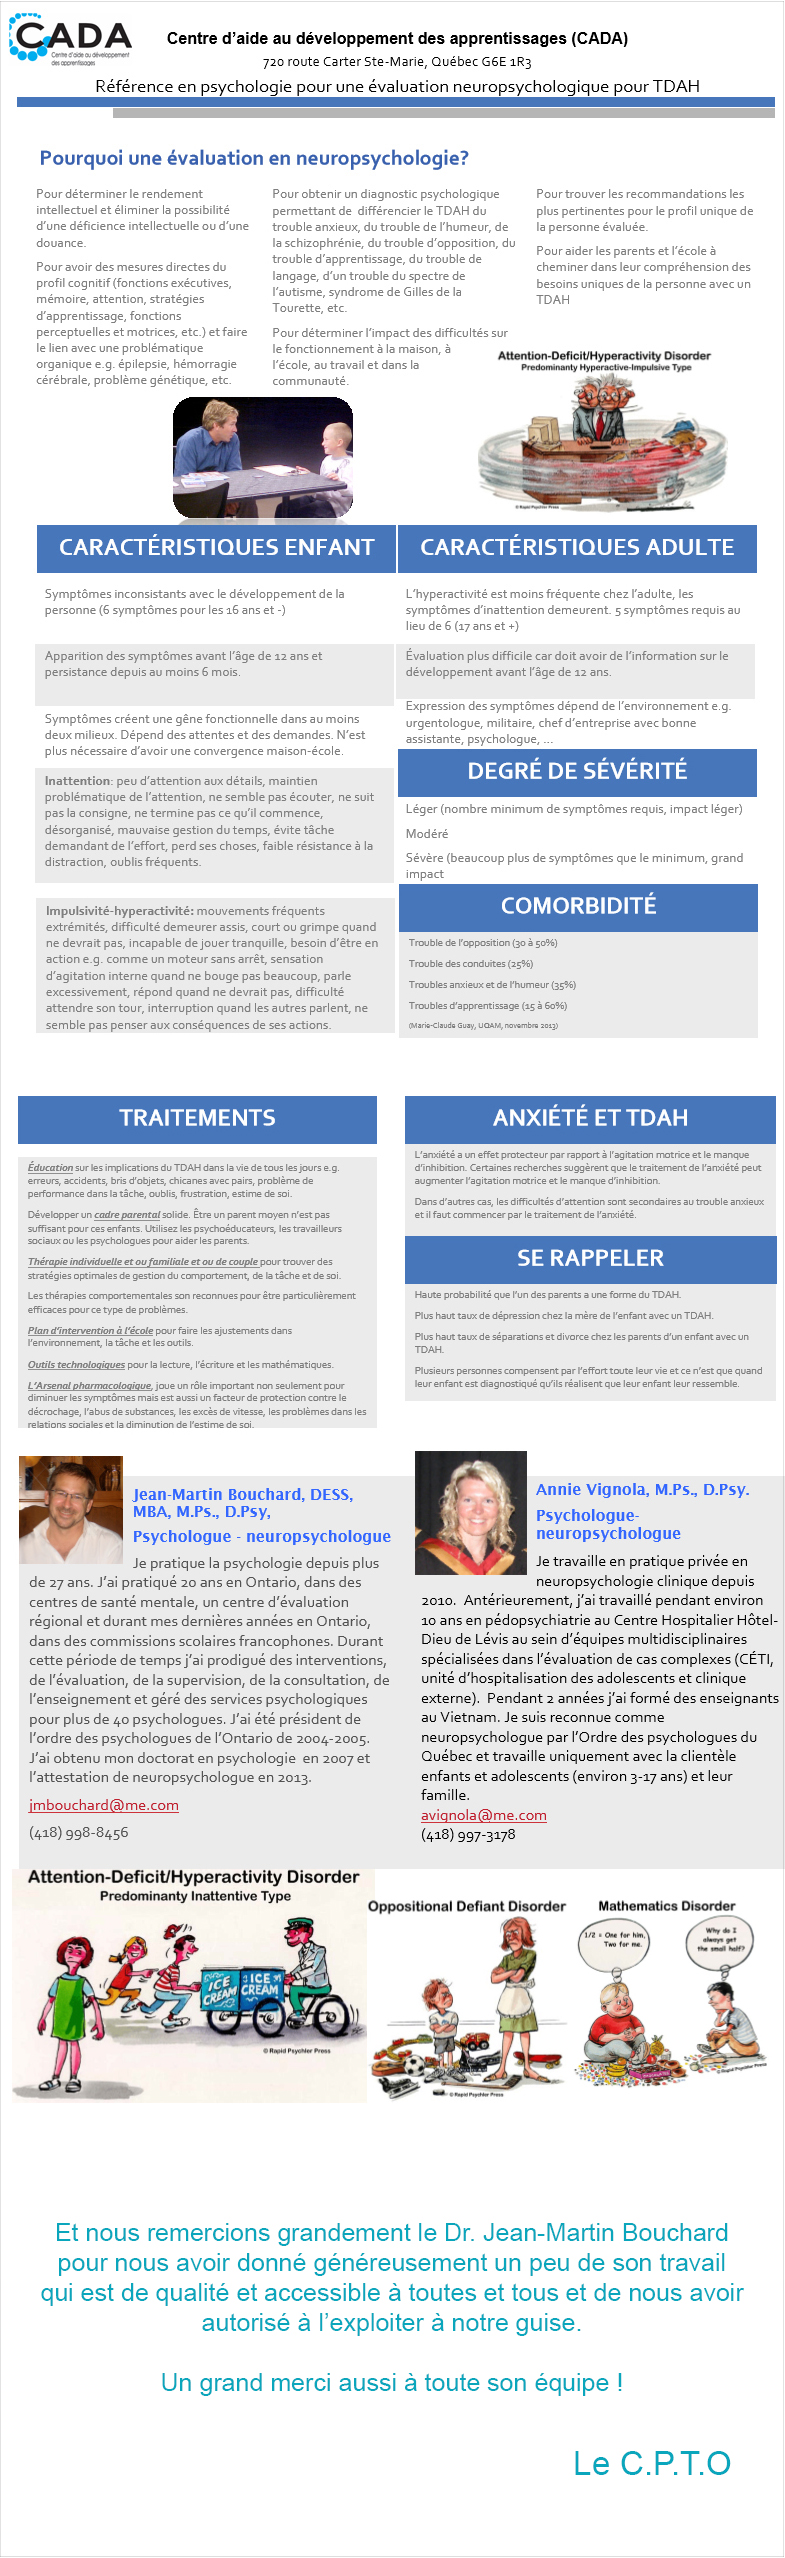 ADHD handout France